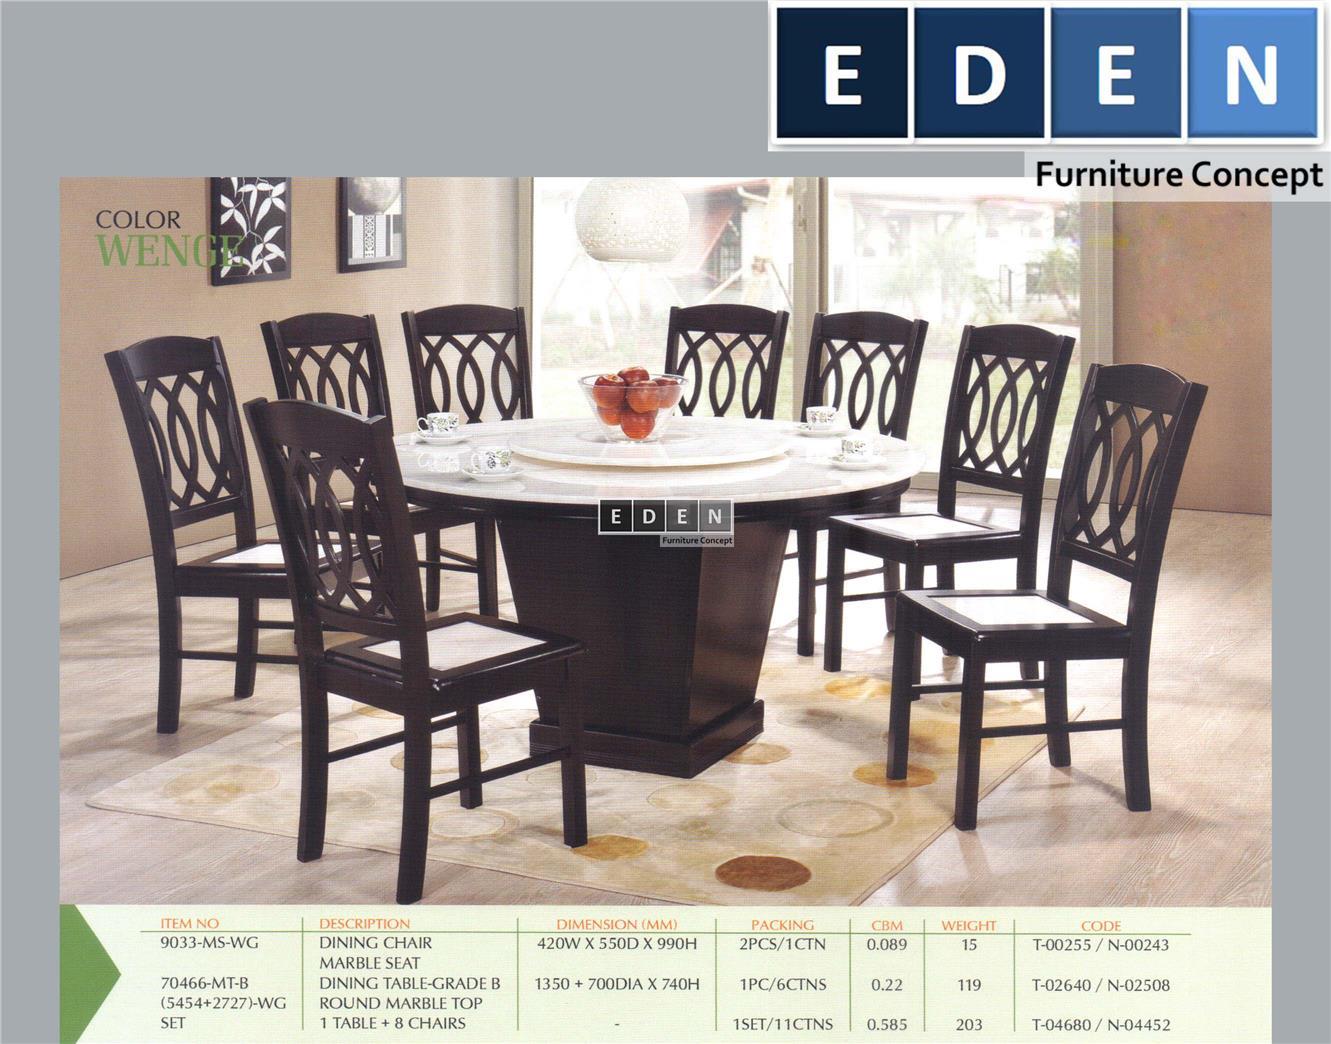 FURNITURE MALAYSIA KITCHEN DINING end 632017 1015 AM : furniture malaysia kitchen dining table set meja makan set 70466s kykstore 1506 04 KYKstore3 from www.lelong.com.my size 1331 x 1044 jpeg 183kB